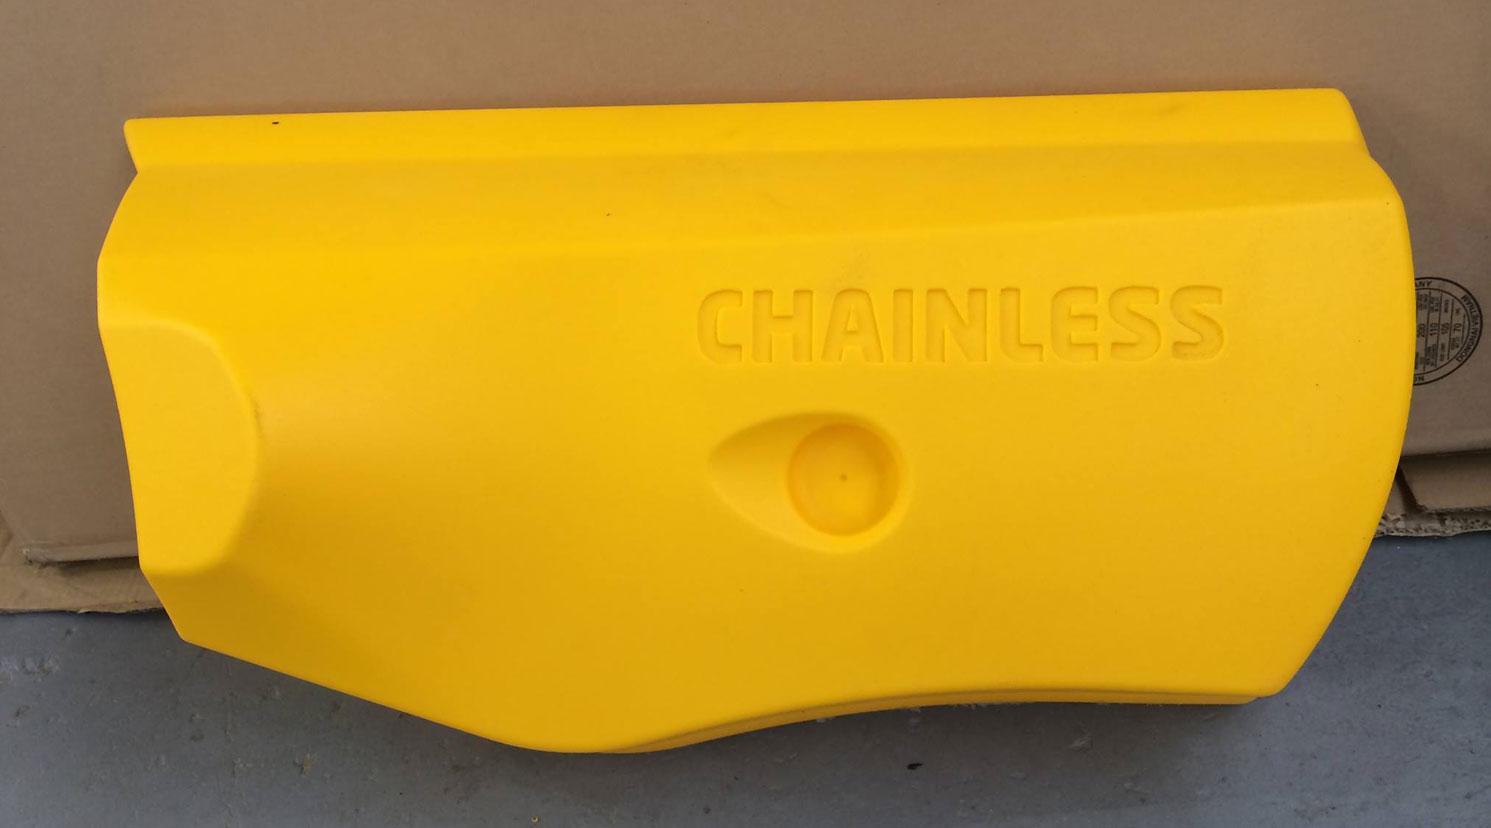 Rotational Moulding for Farm Equipment by Classique Plastics